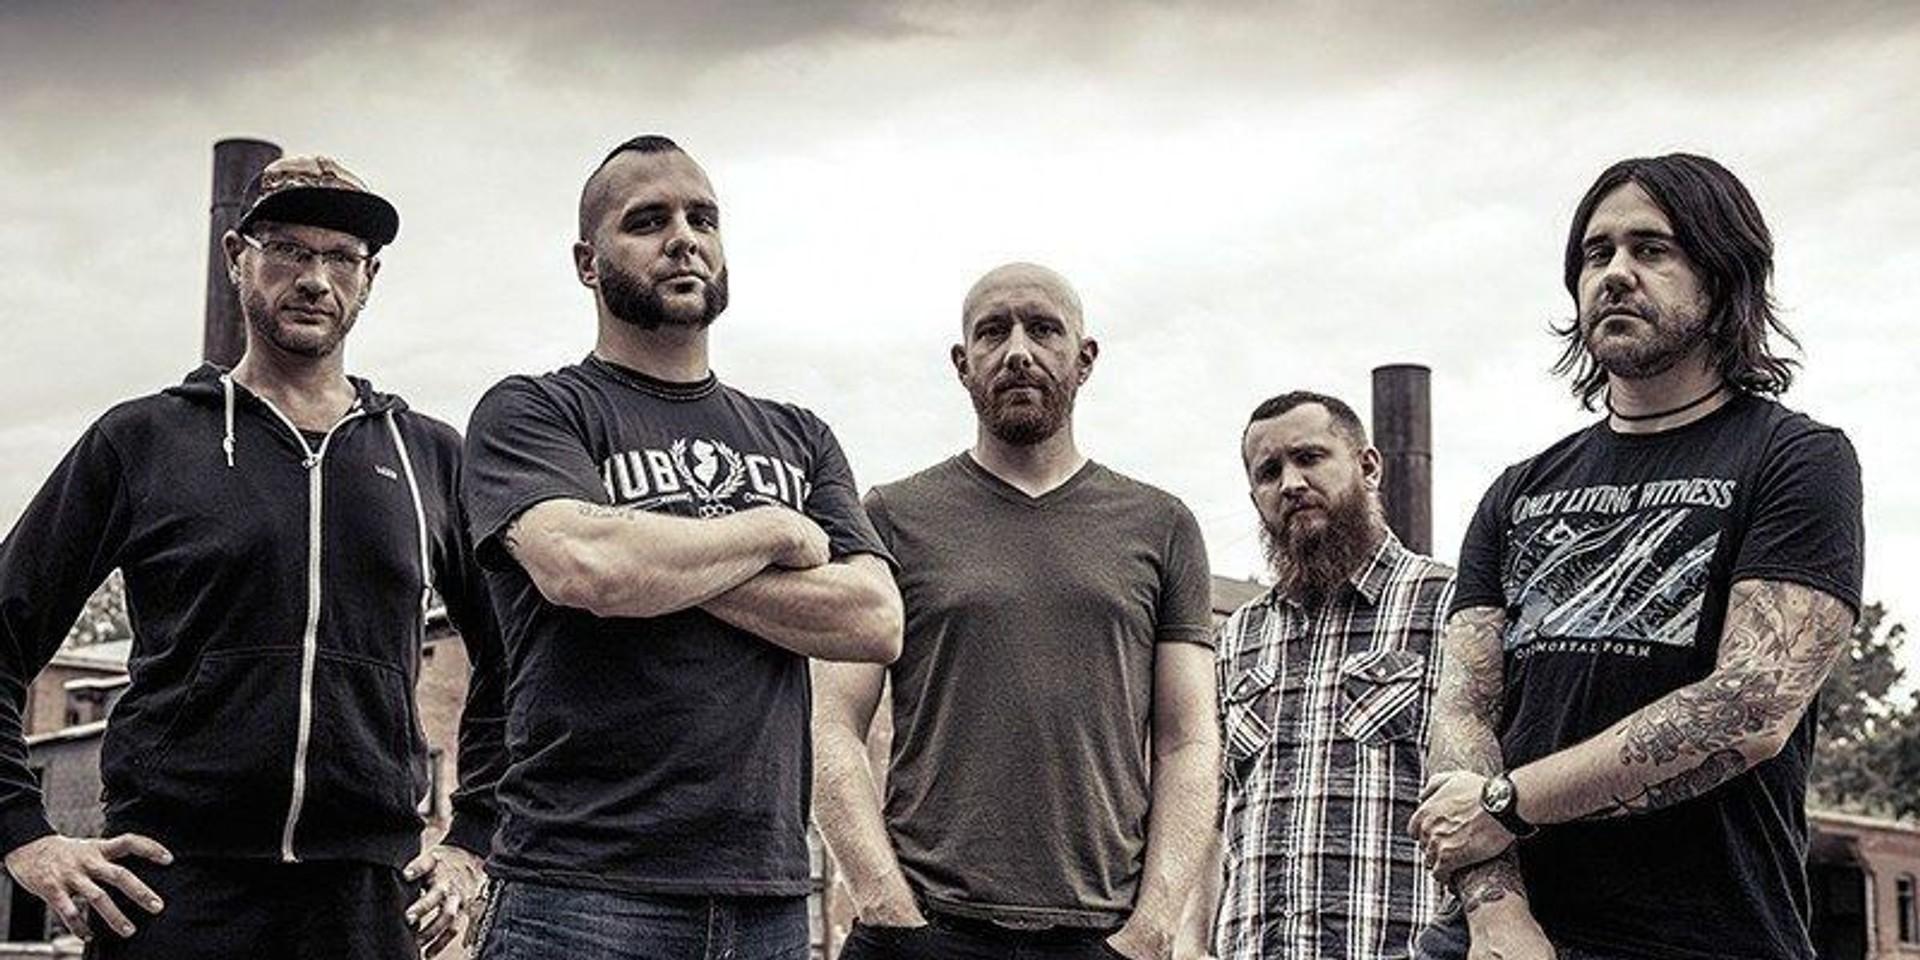 Killswitch Engage announces new album releasing this autumn